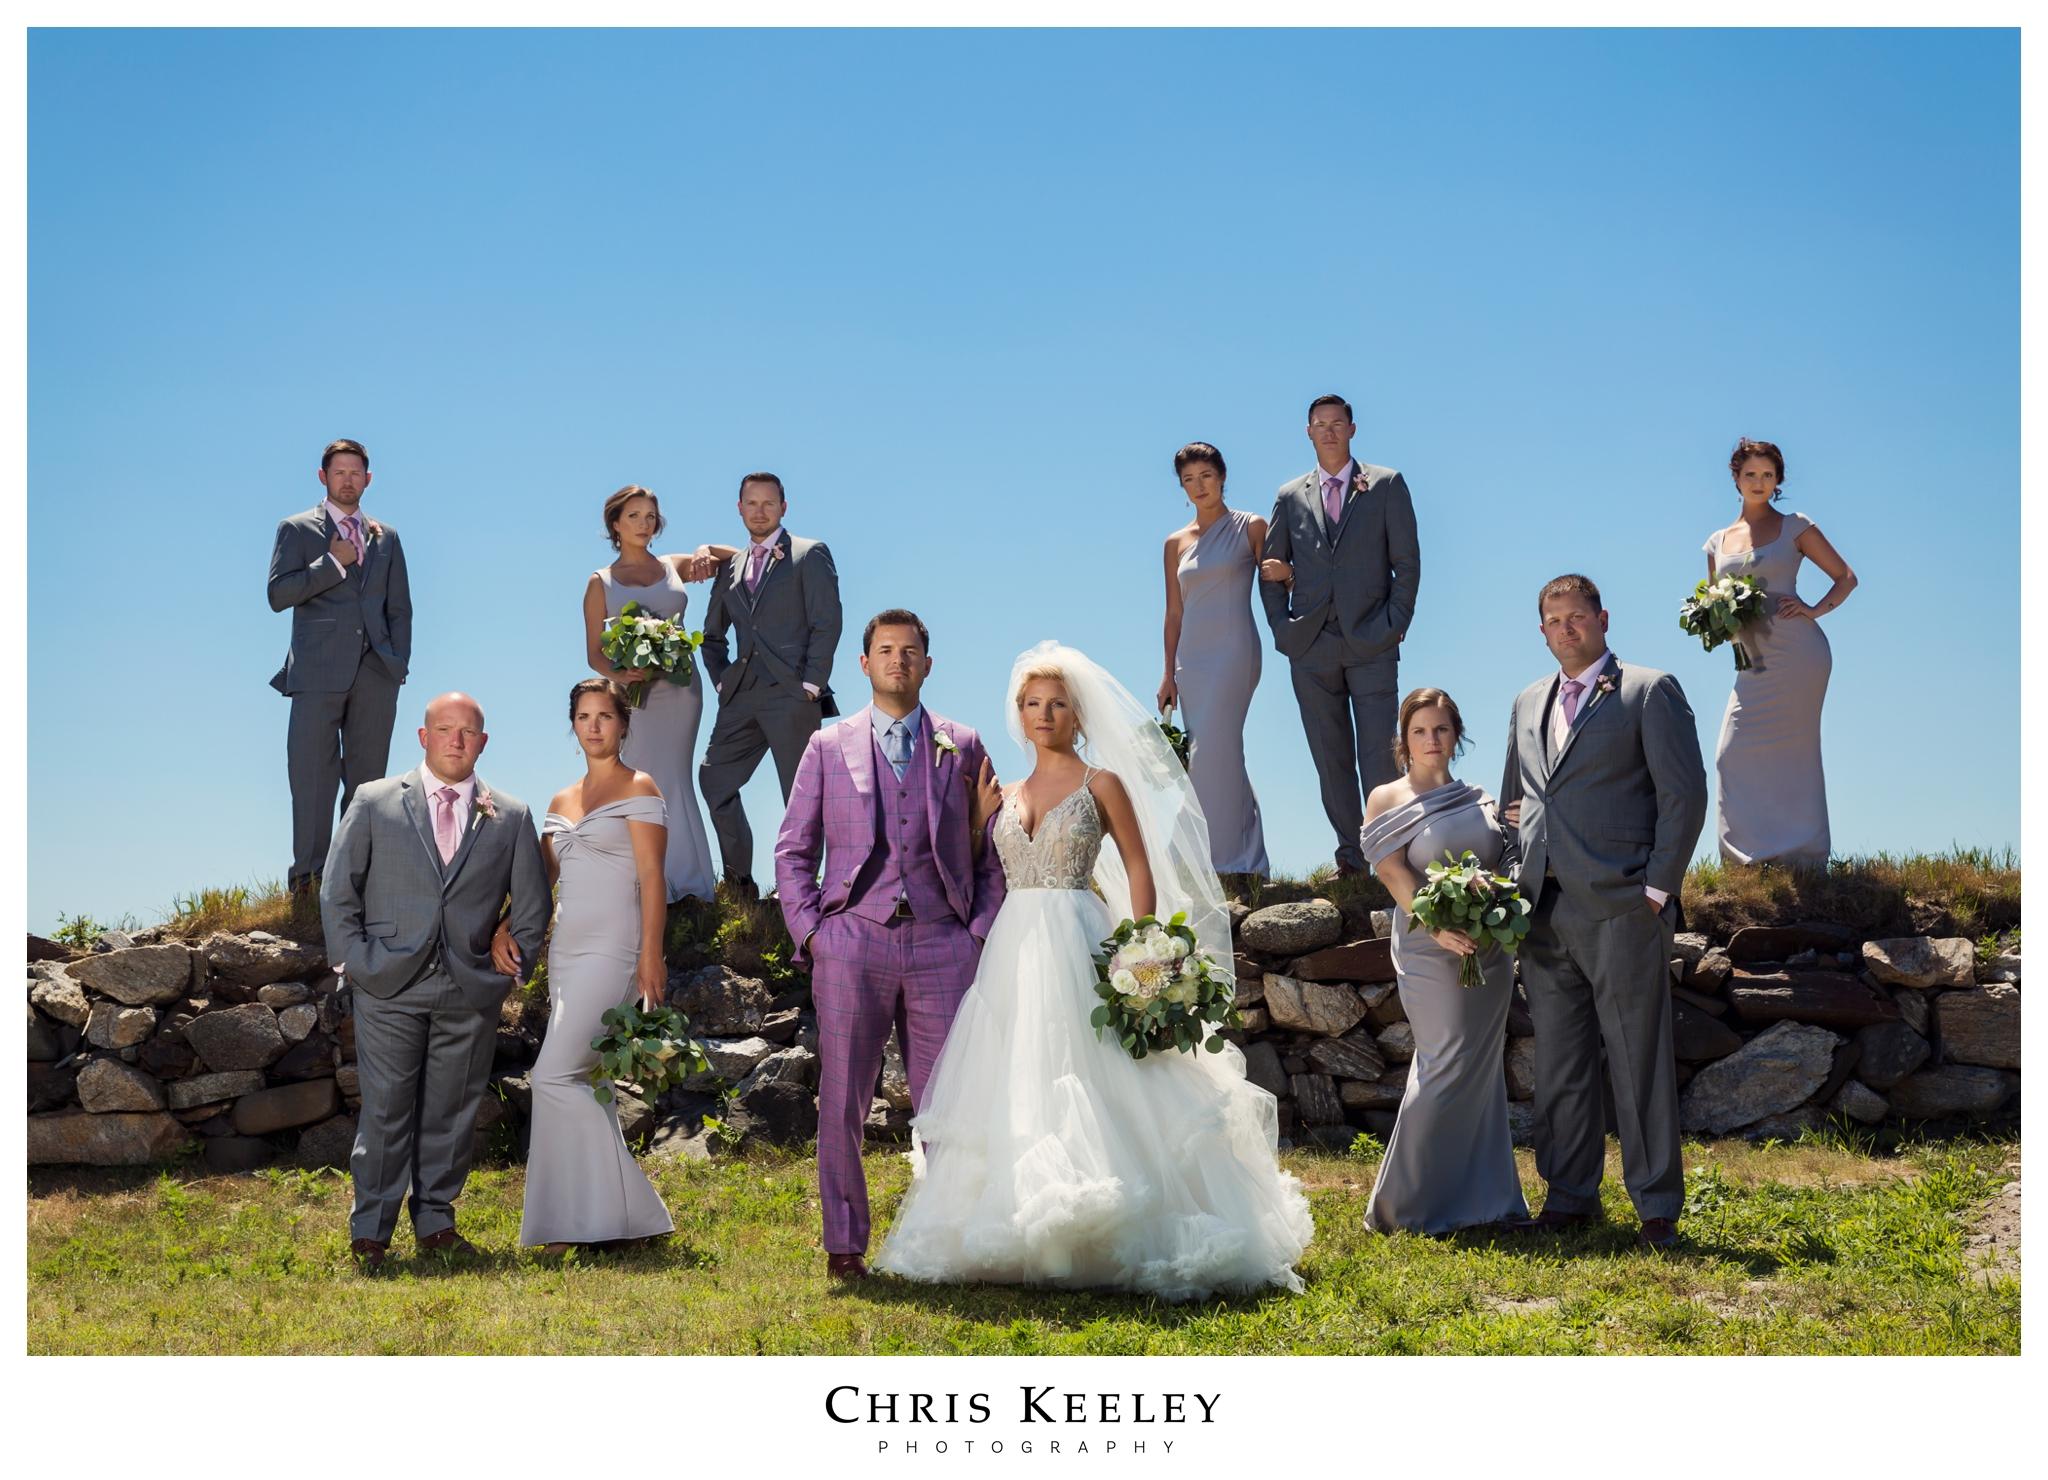 epic-wedding-party-portrait.jpg